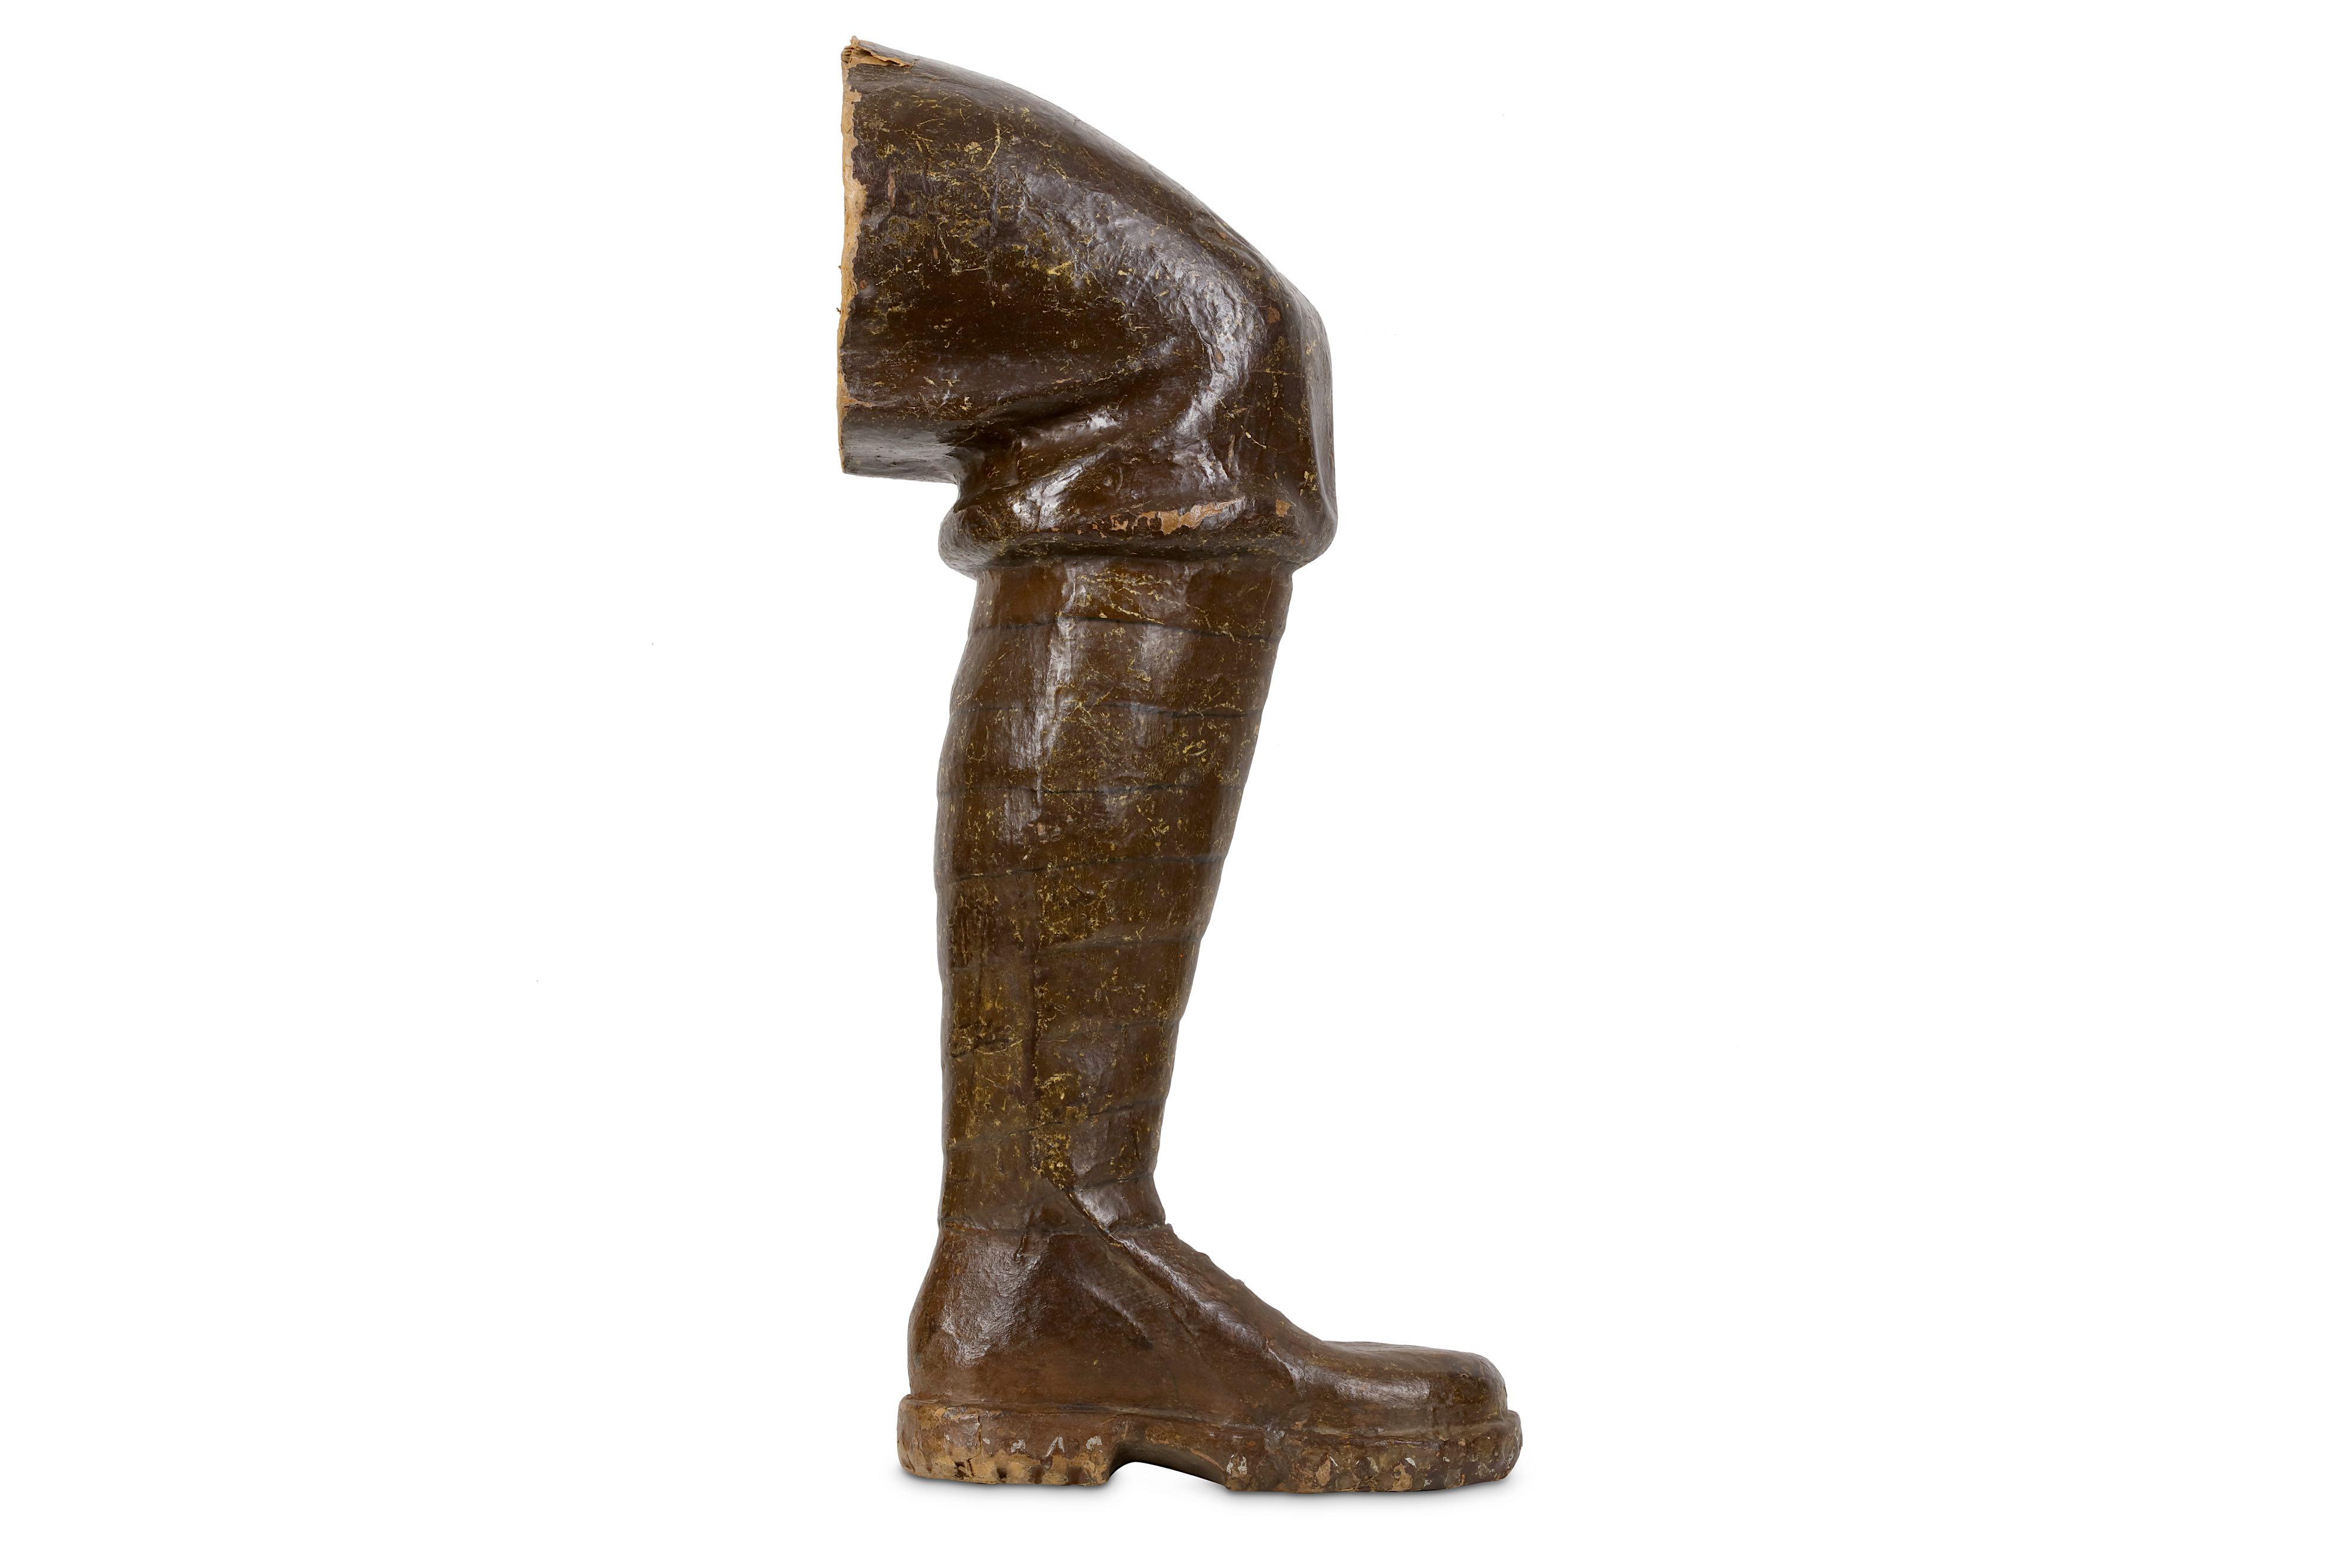 Lot 53 - AN EARLY 20TH CENTURY PAPIER MACHE MODEL OF A WW1 SOLDIER'S LEG